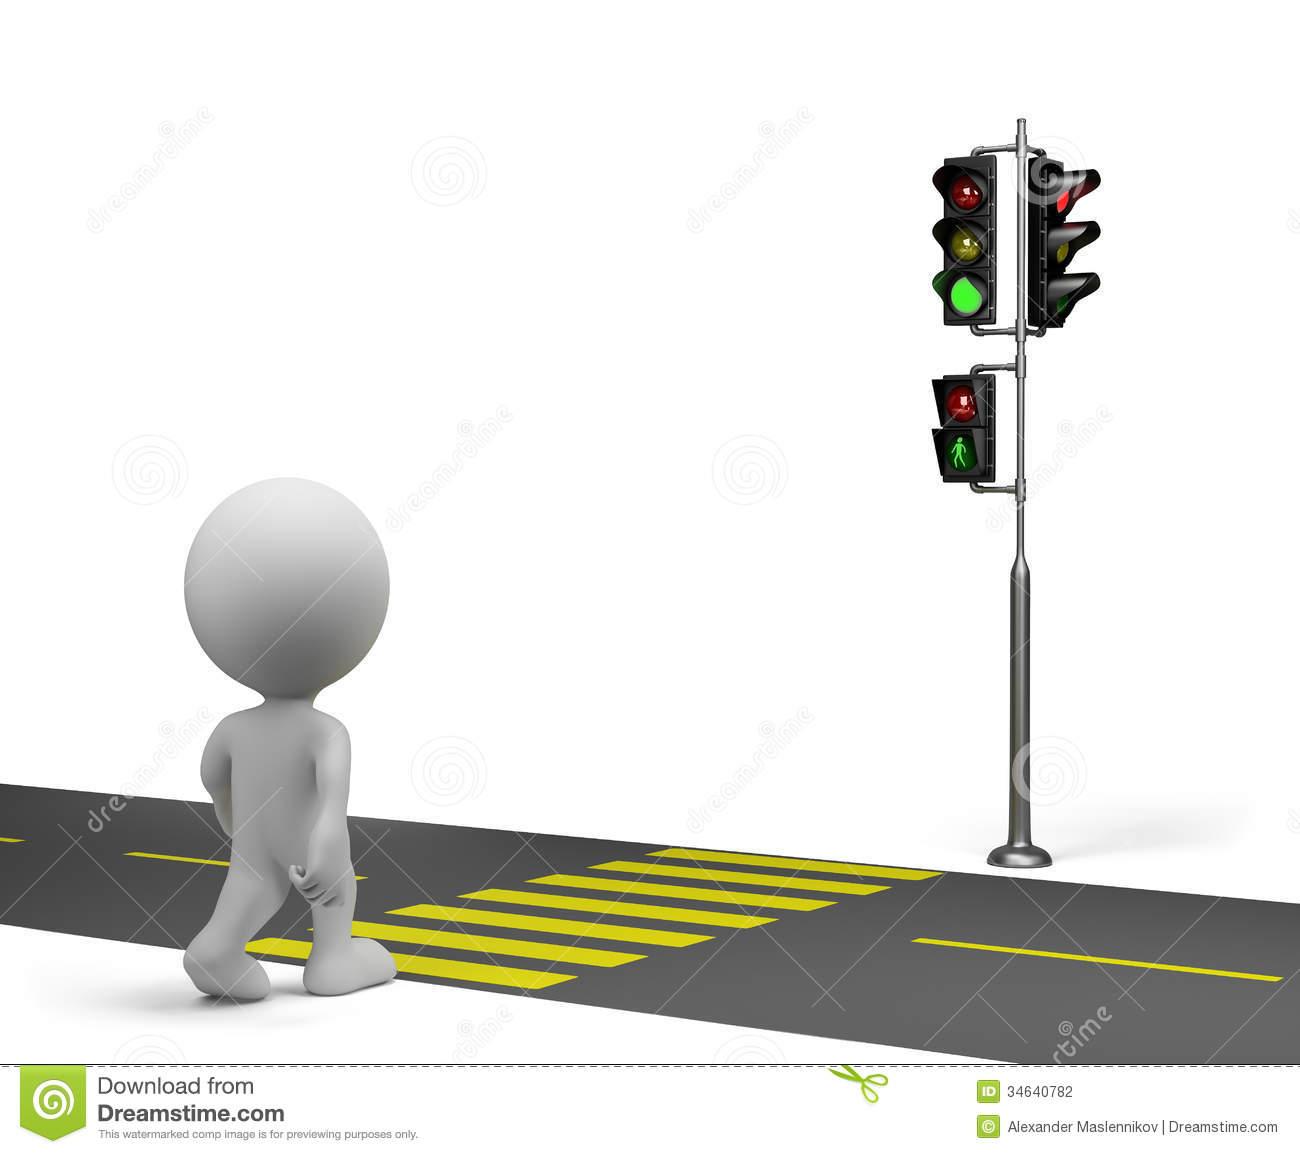 Walk Traffic Light Clipart - Clipart Kid